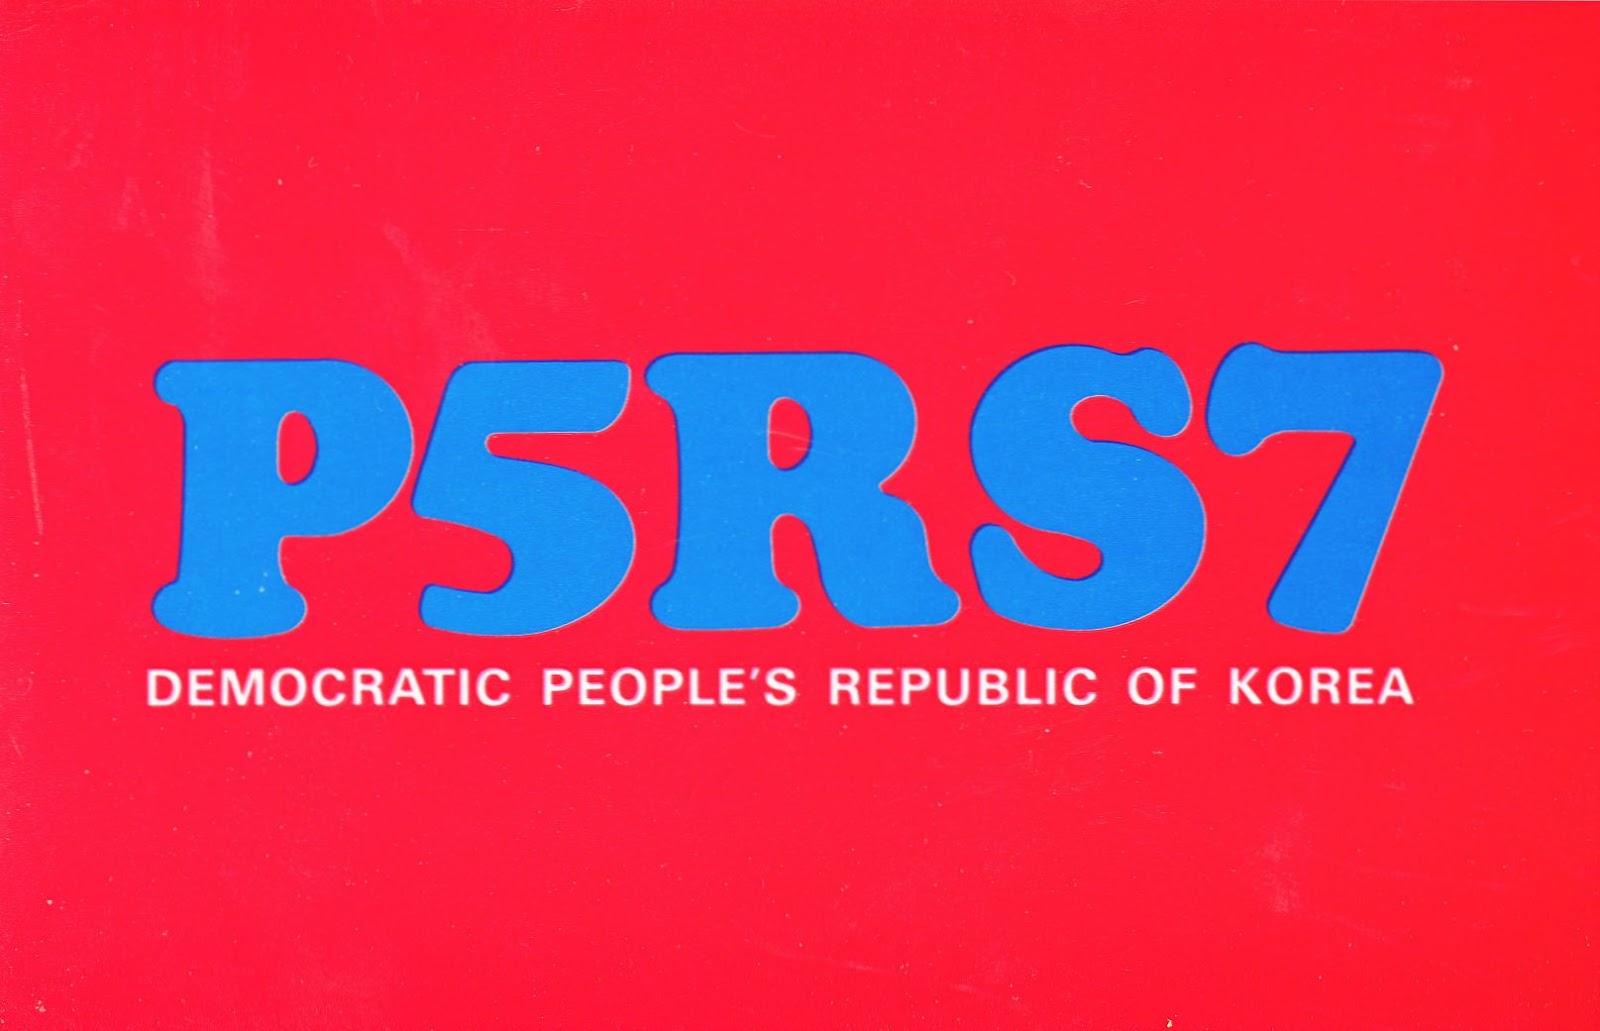 http://www.3w3rr.ru/2012/09/P5RS7.html